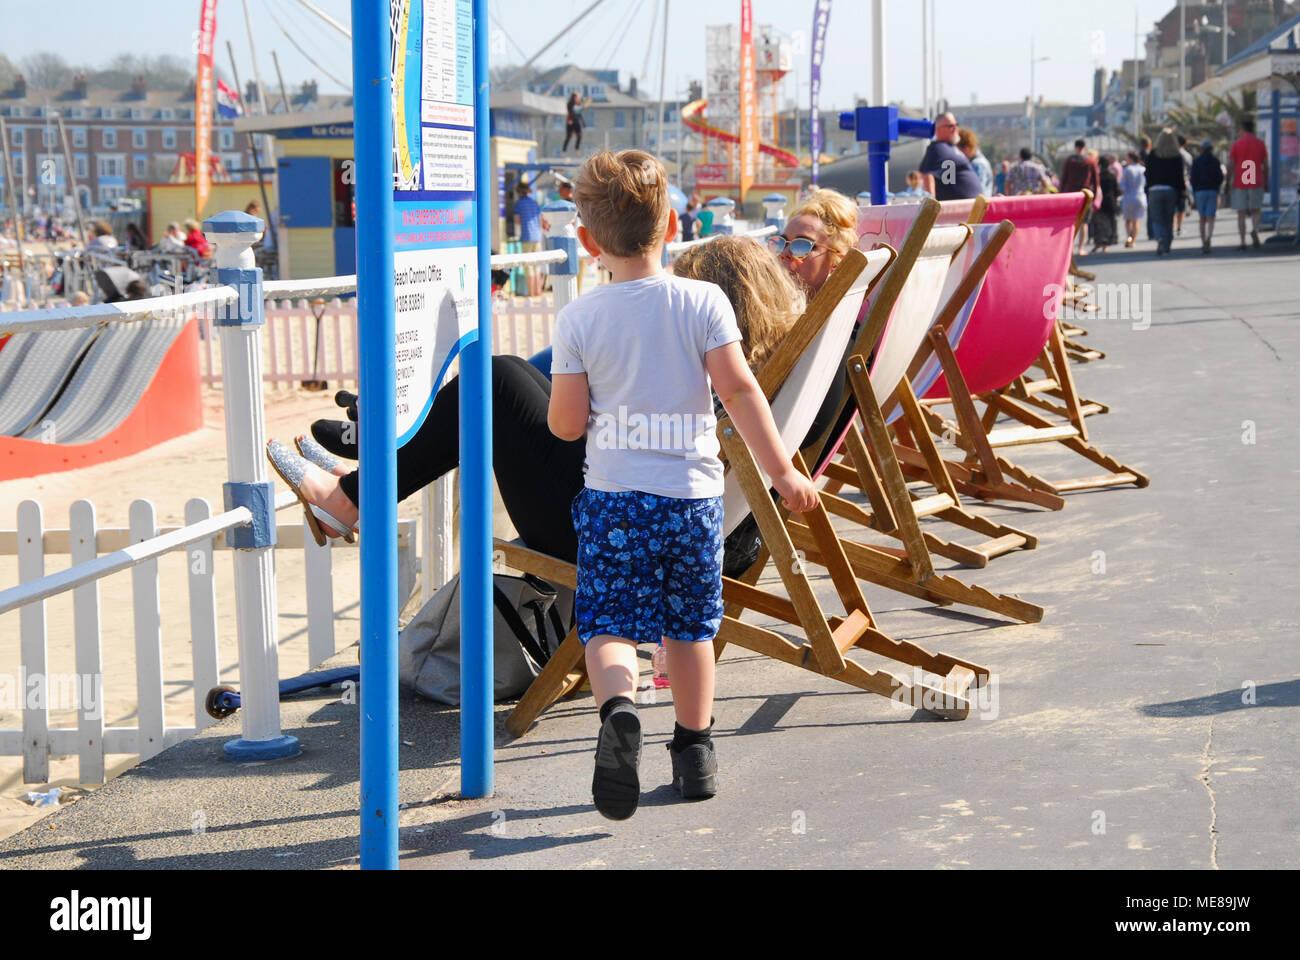 Weymouth, Dorset. 21st April 2018. Familes enjoy the sunshine on Weymouth's promenade Credit: stuart fretwell/Alamy Live News - Stock Image